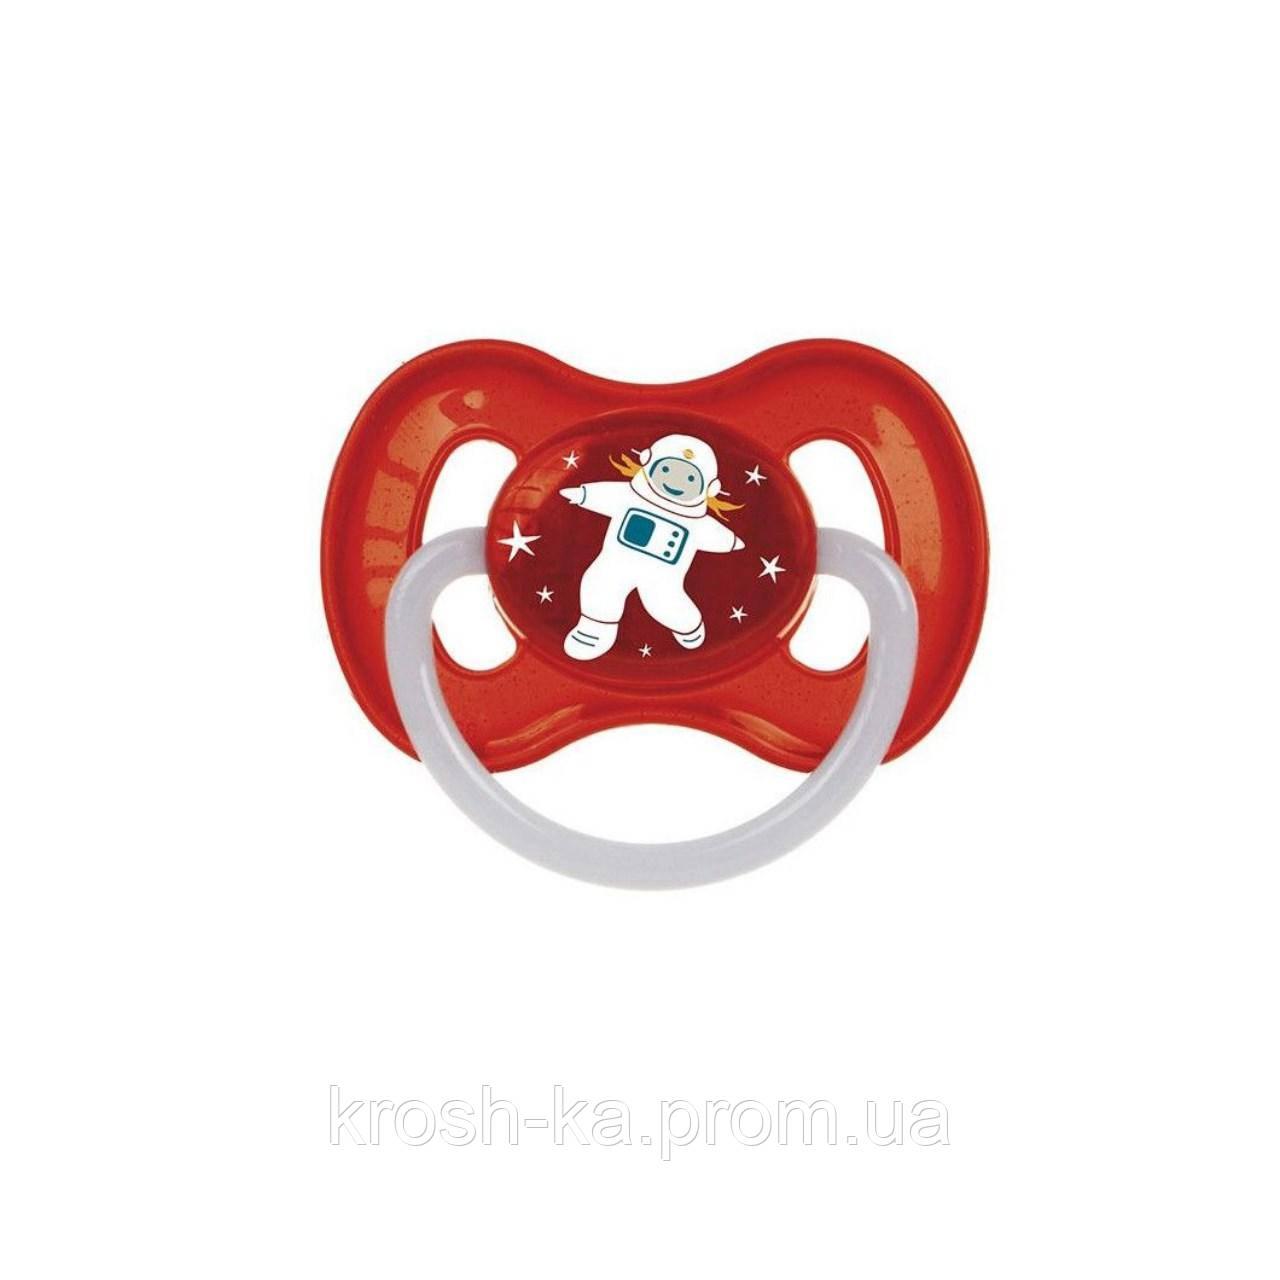 Пустышка латексная круглая 0-6м Space красный Canpol Babies Польша 23/221